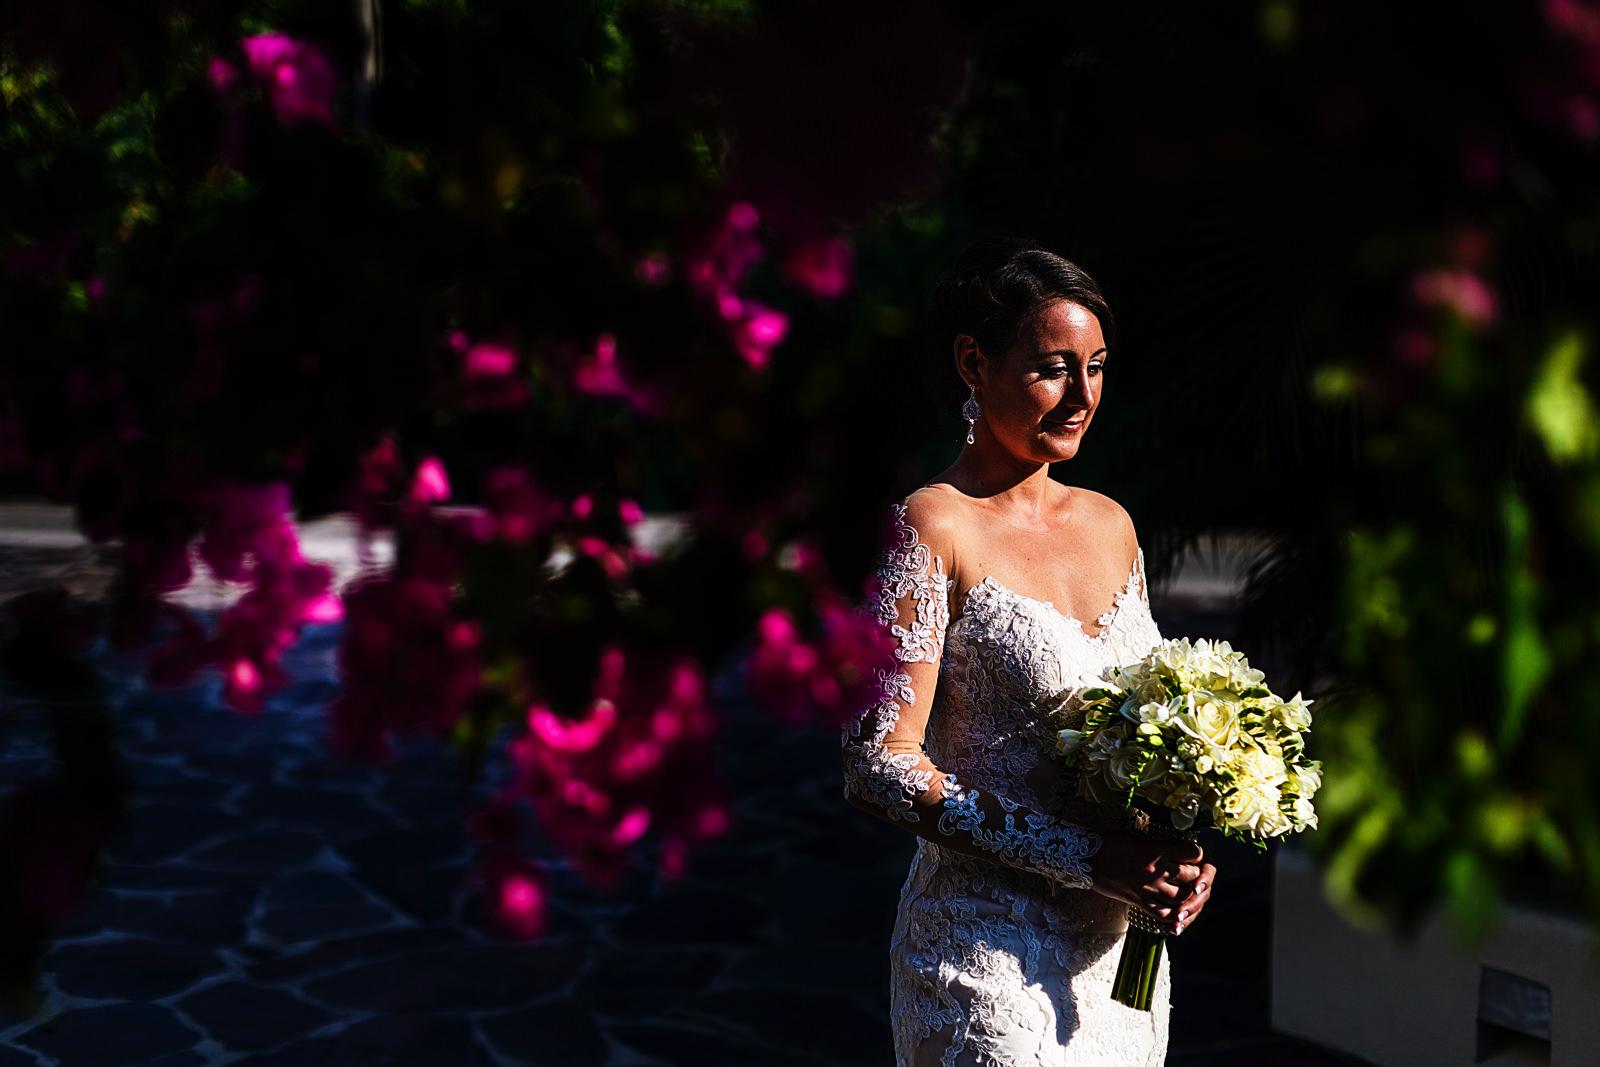 Portrait of the bride across some bugambilias